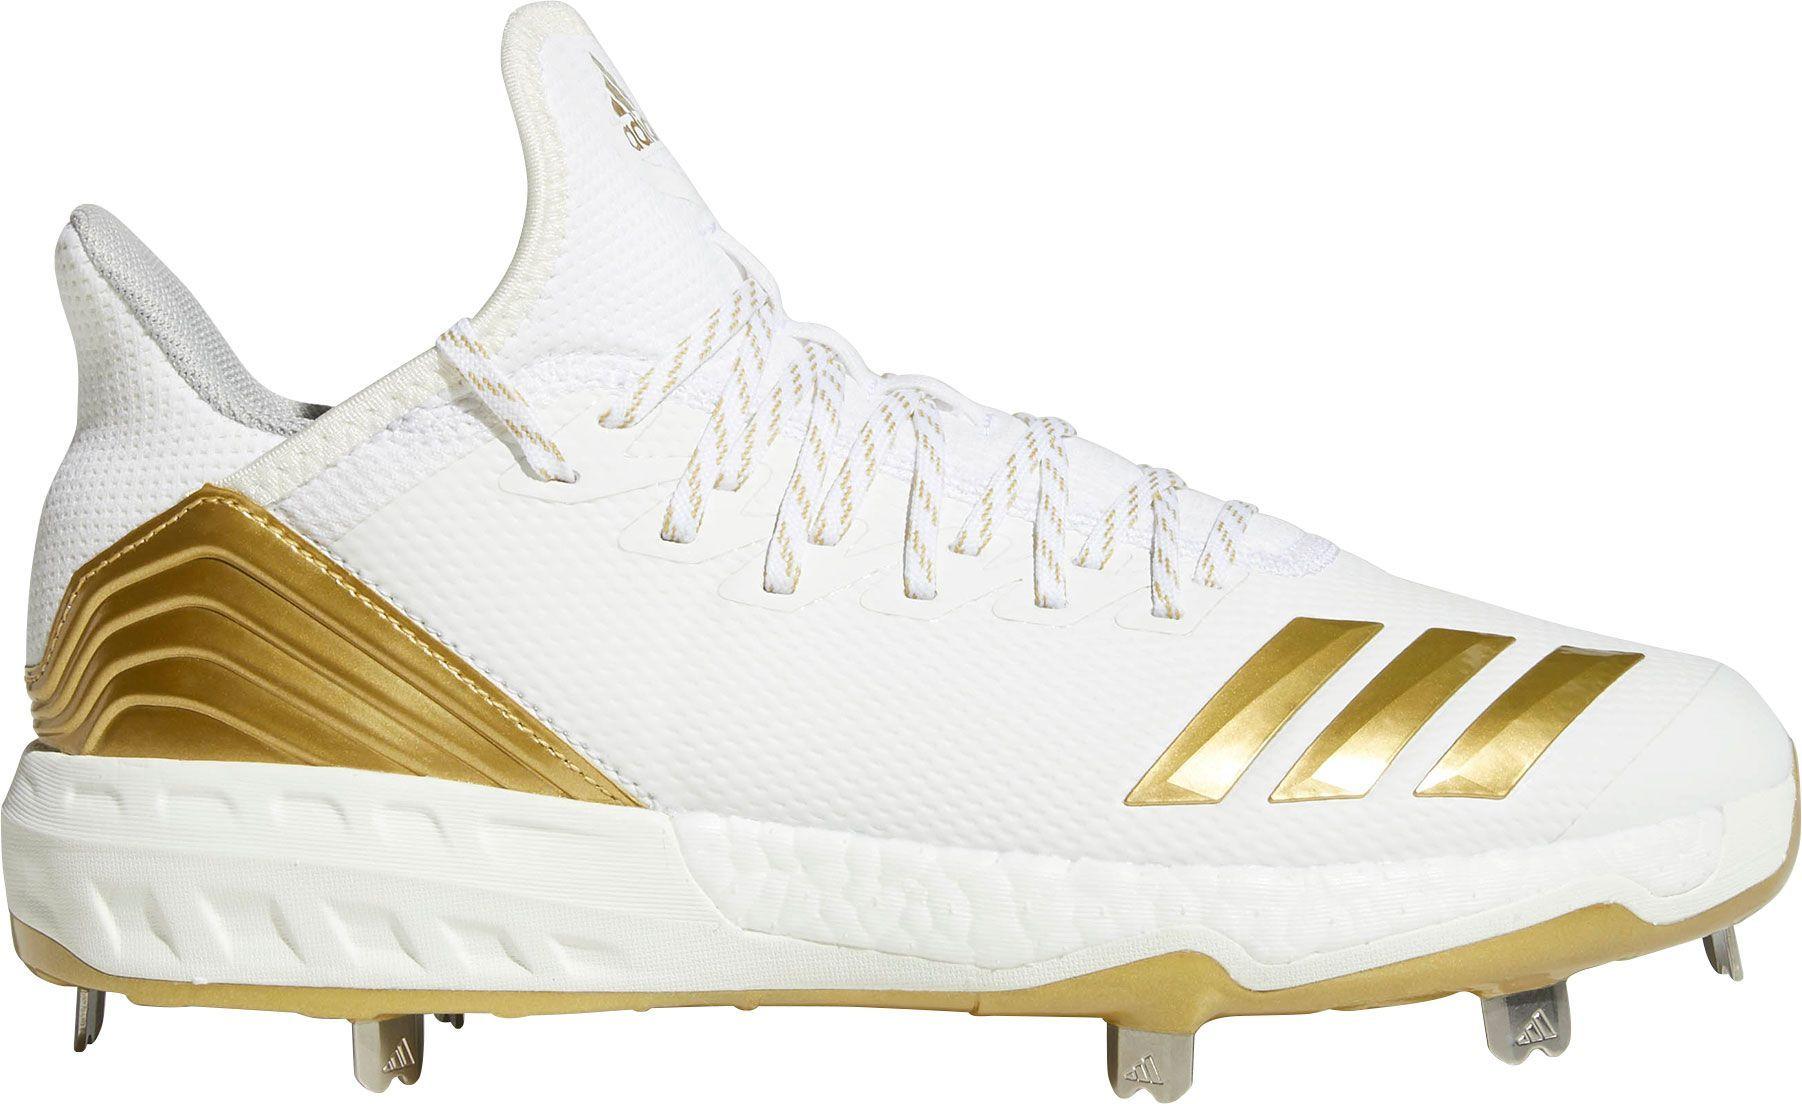 los angeles 01934 adf08 adidas Mens Icon 4 Metal Baseball Cleats, Size 13.0, White